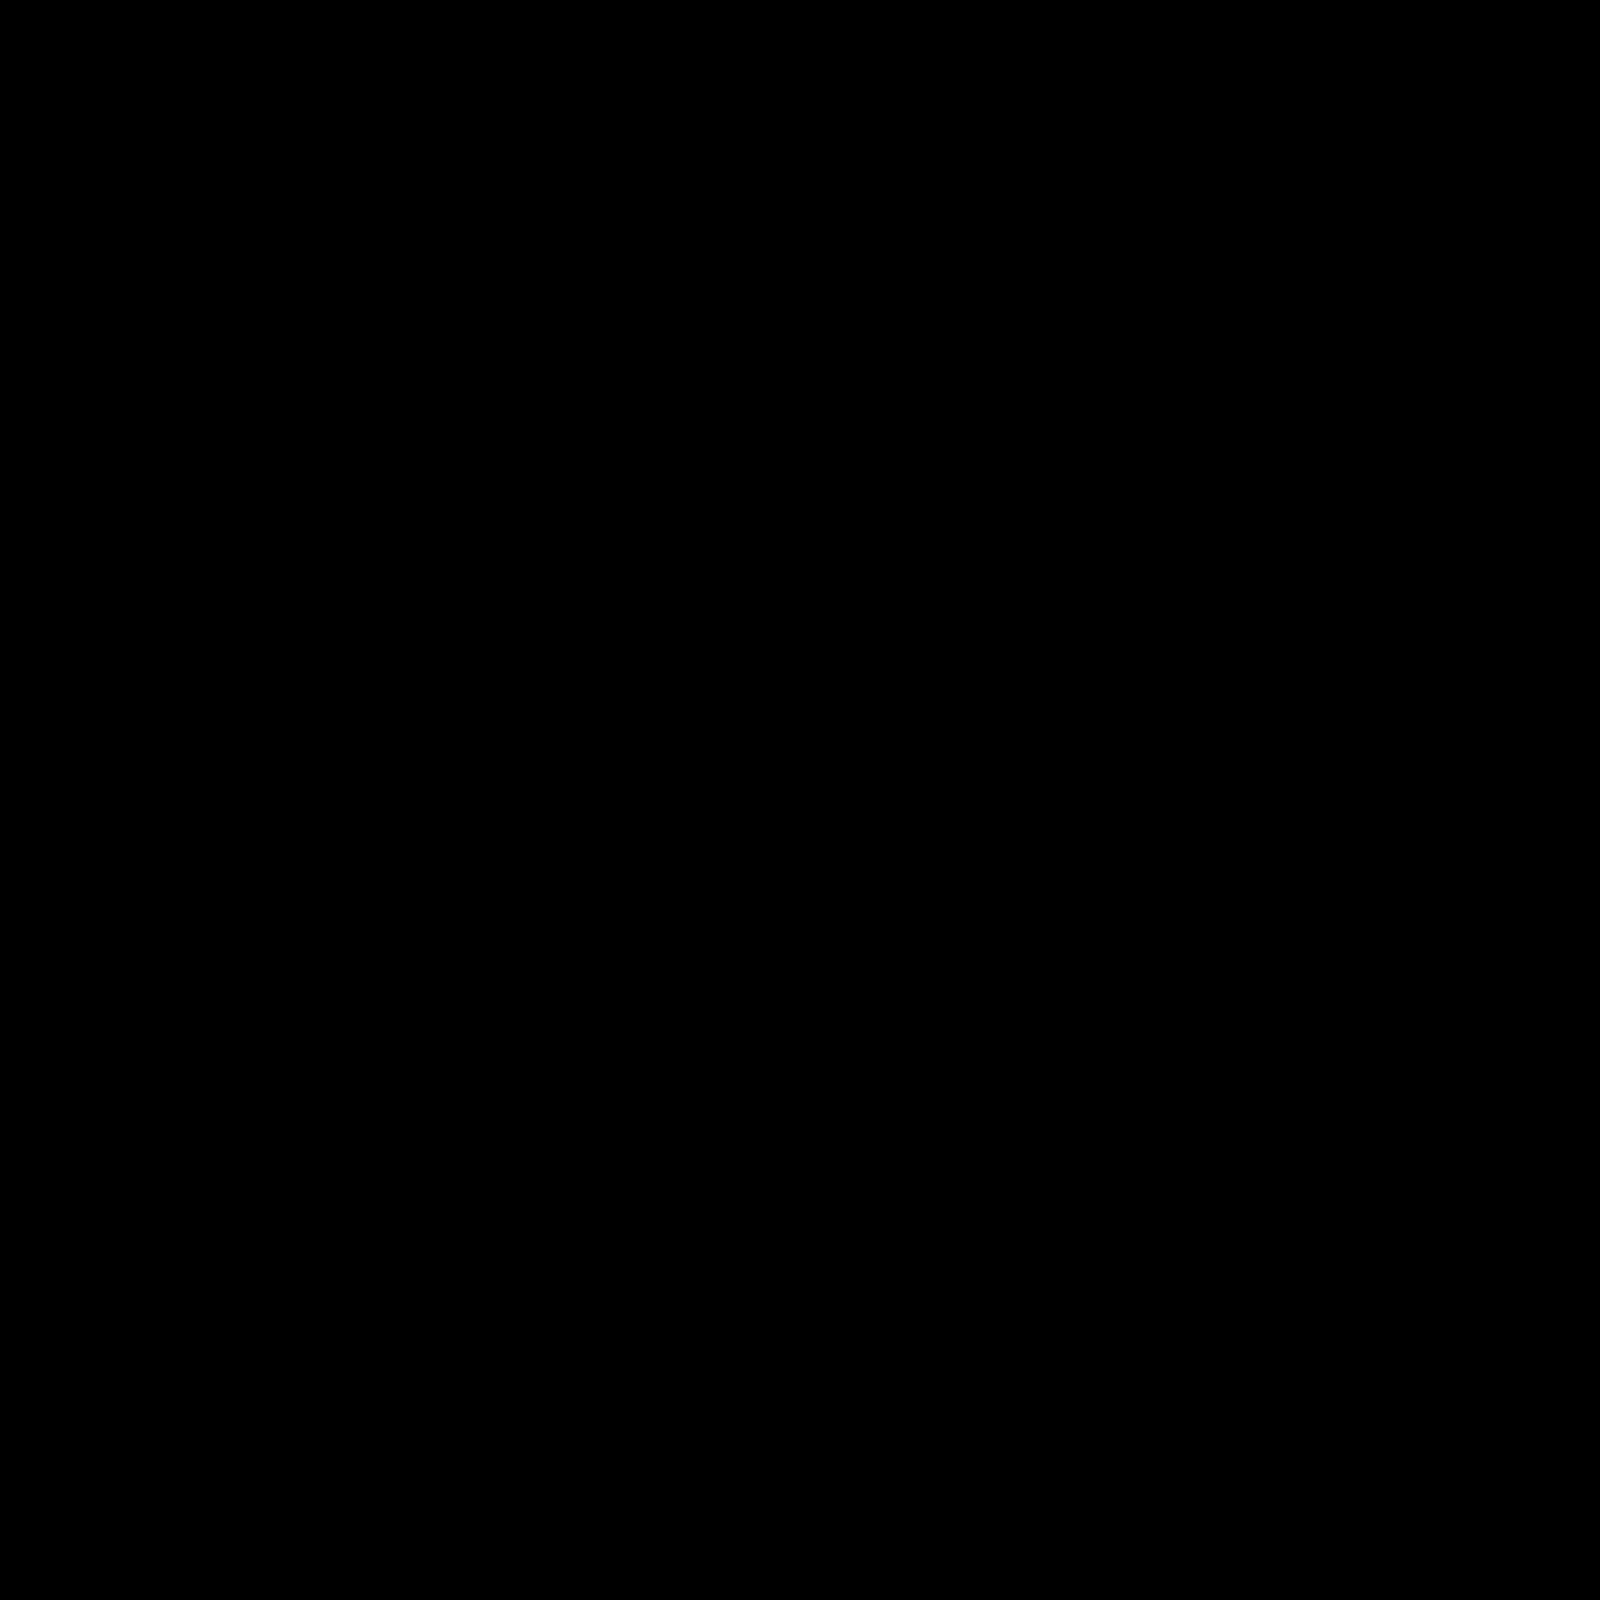 1600x1600 Hexagon Icon